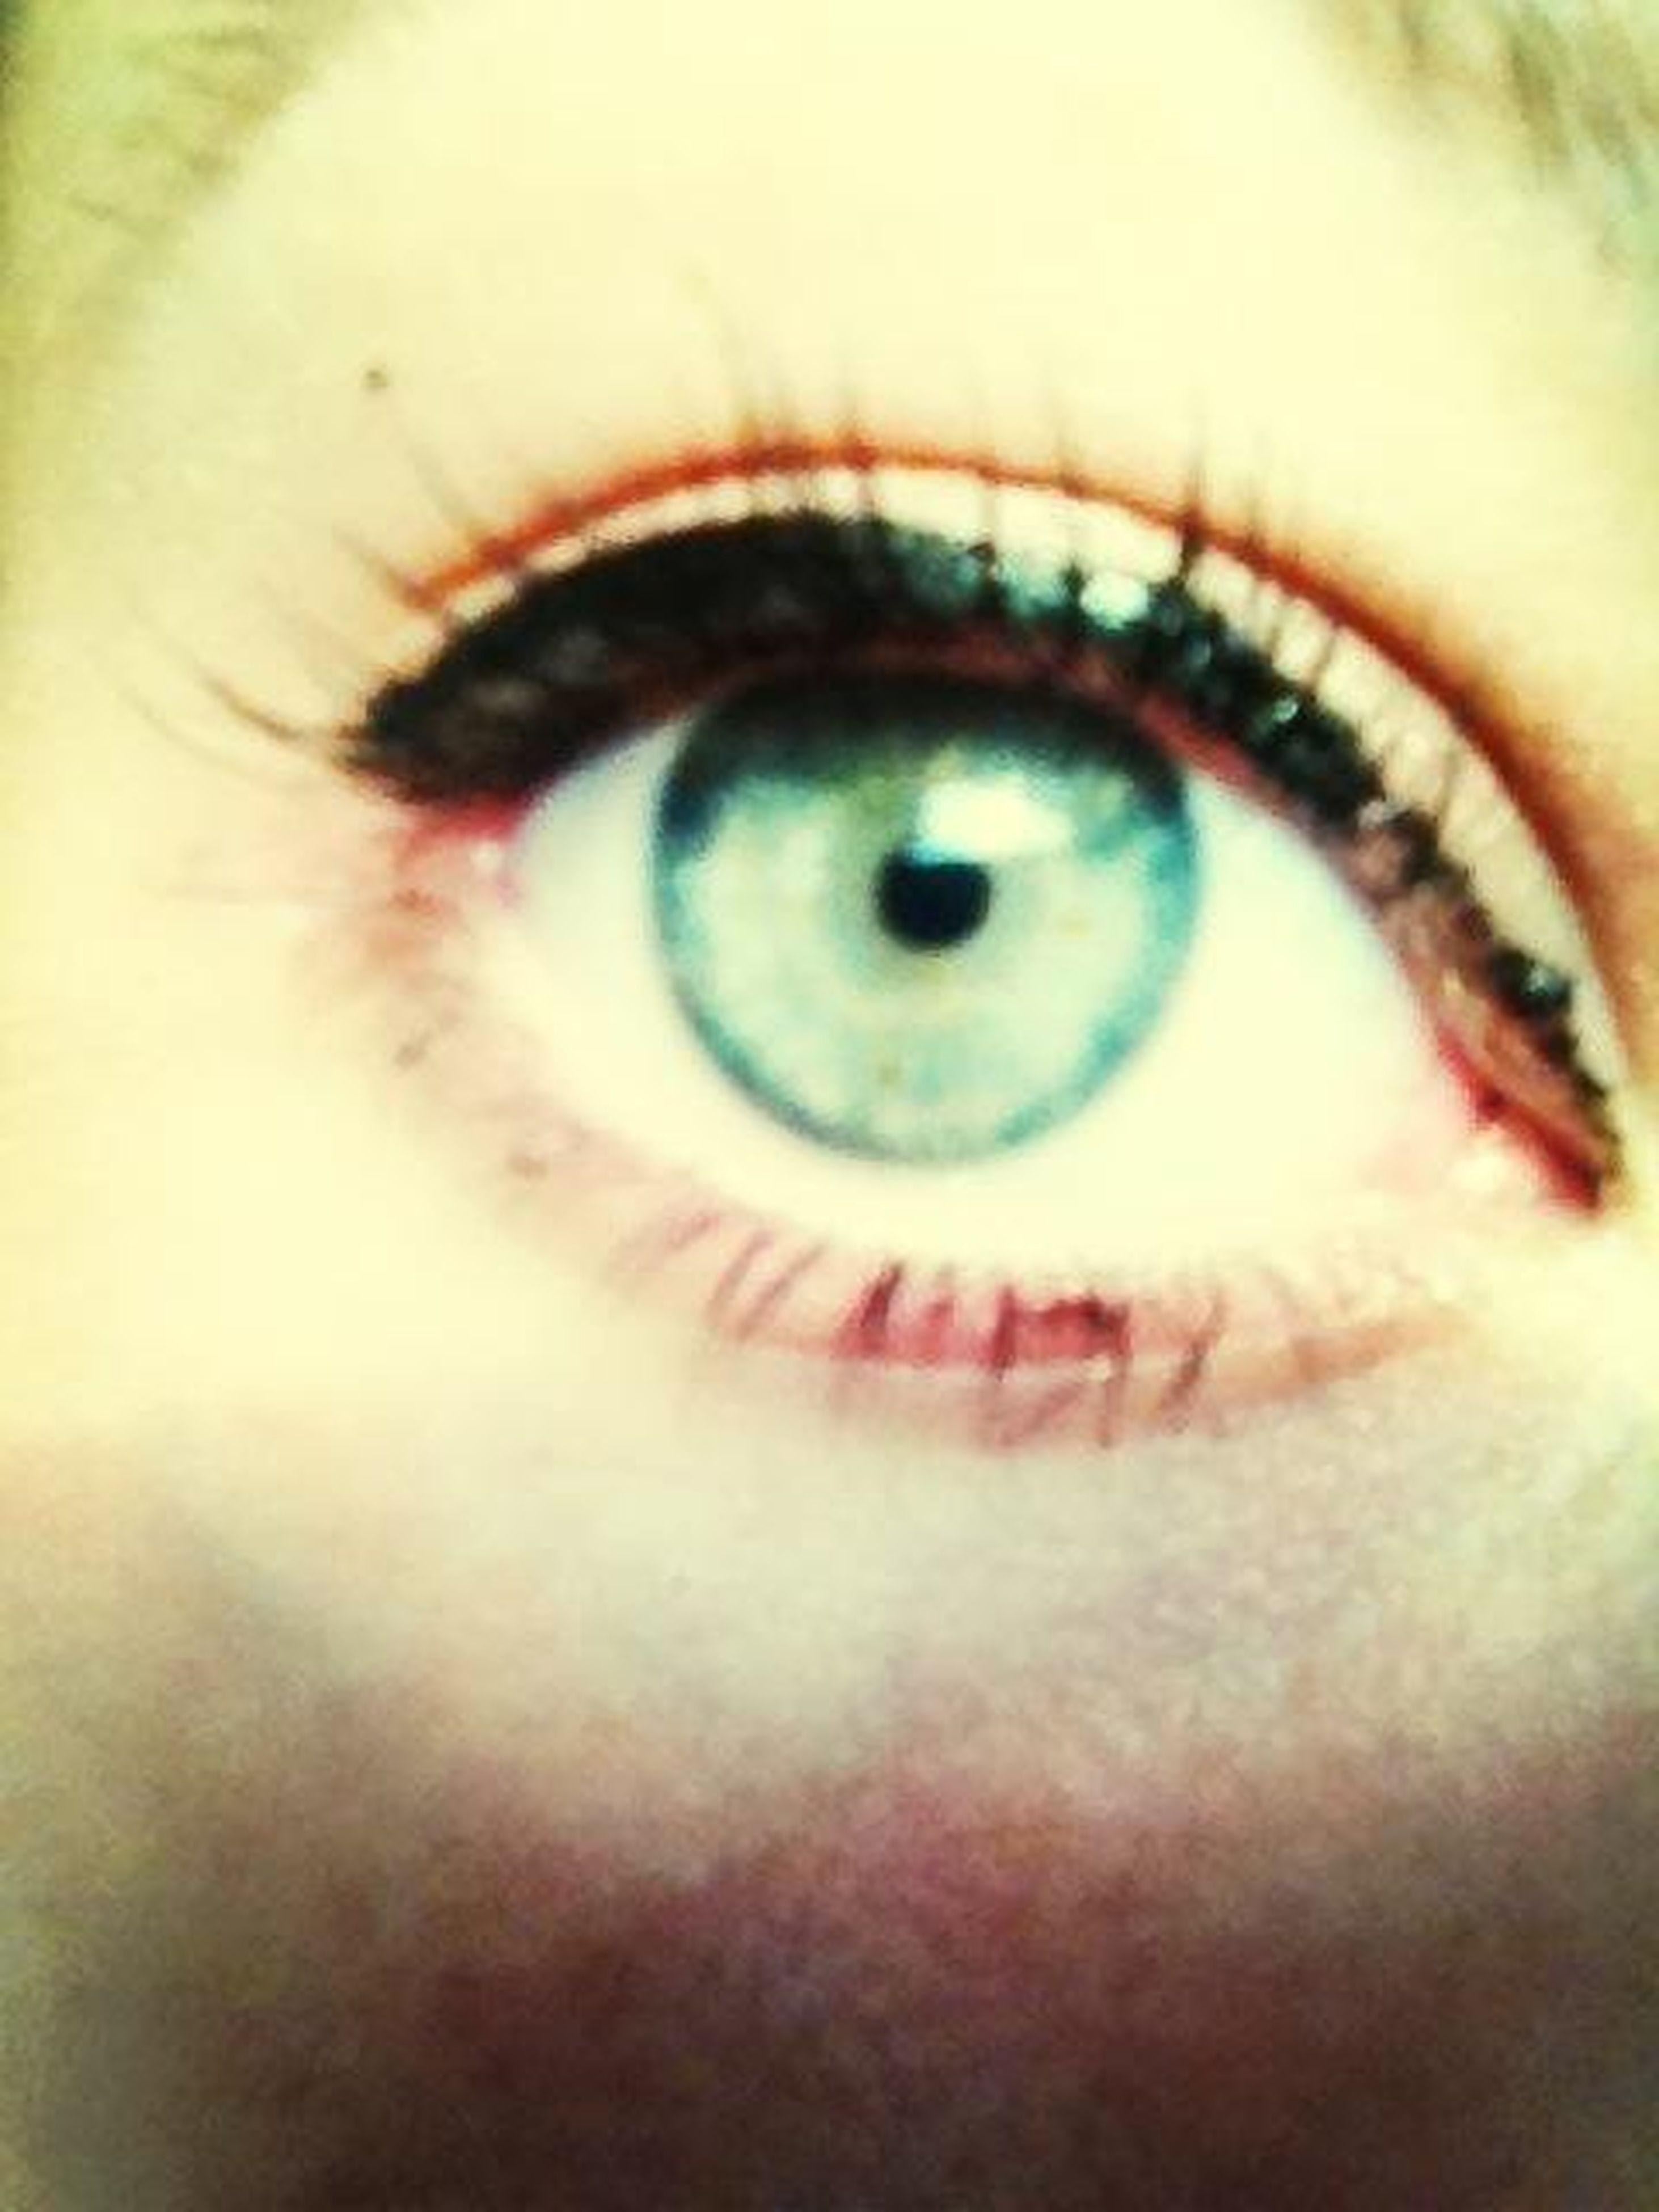 human eye, eyelash, close-up, eyesight, looking at camera, sensory perception, portrait, extreme close-up, part of, iris - eye, indoors, eyeball, human face, human skin, extreme close up, vision, lifestyles